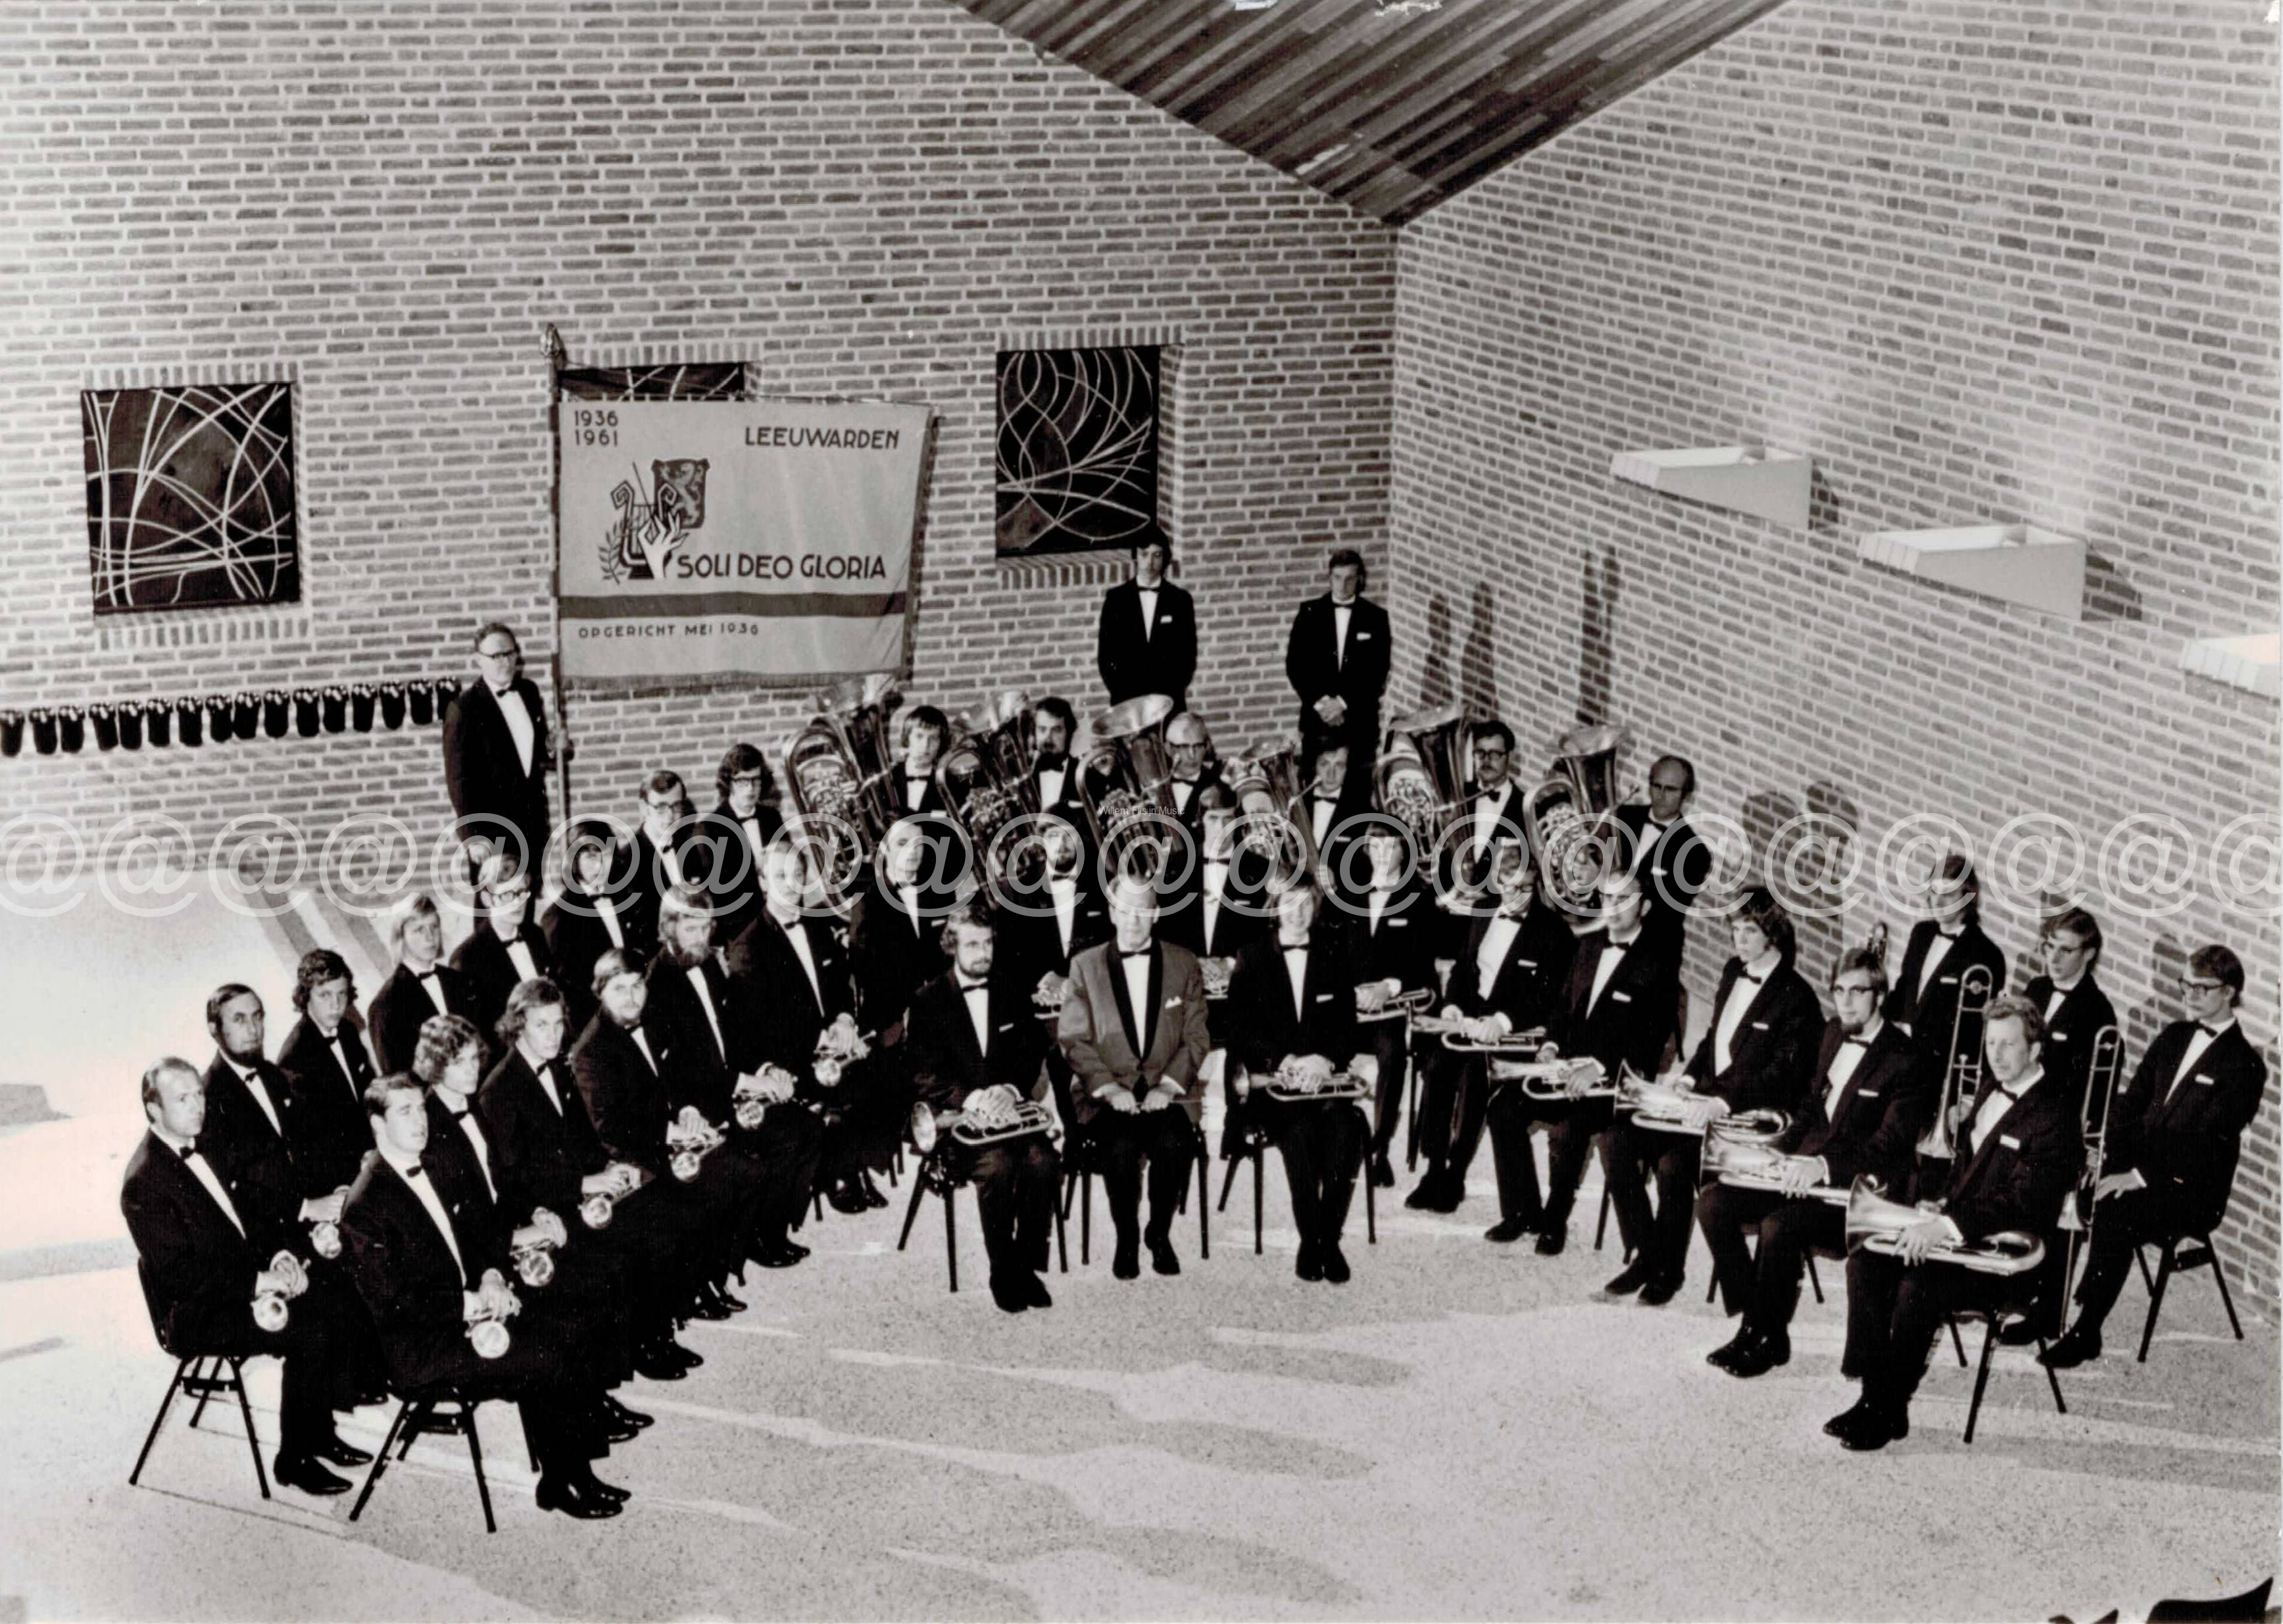 1972 Soli Deo Gloria olv Sjoerd Nieuwland (promofoto Zwitserlandreis)